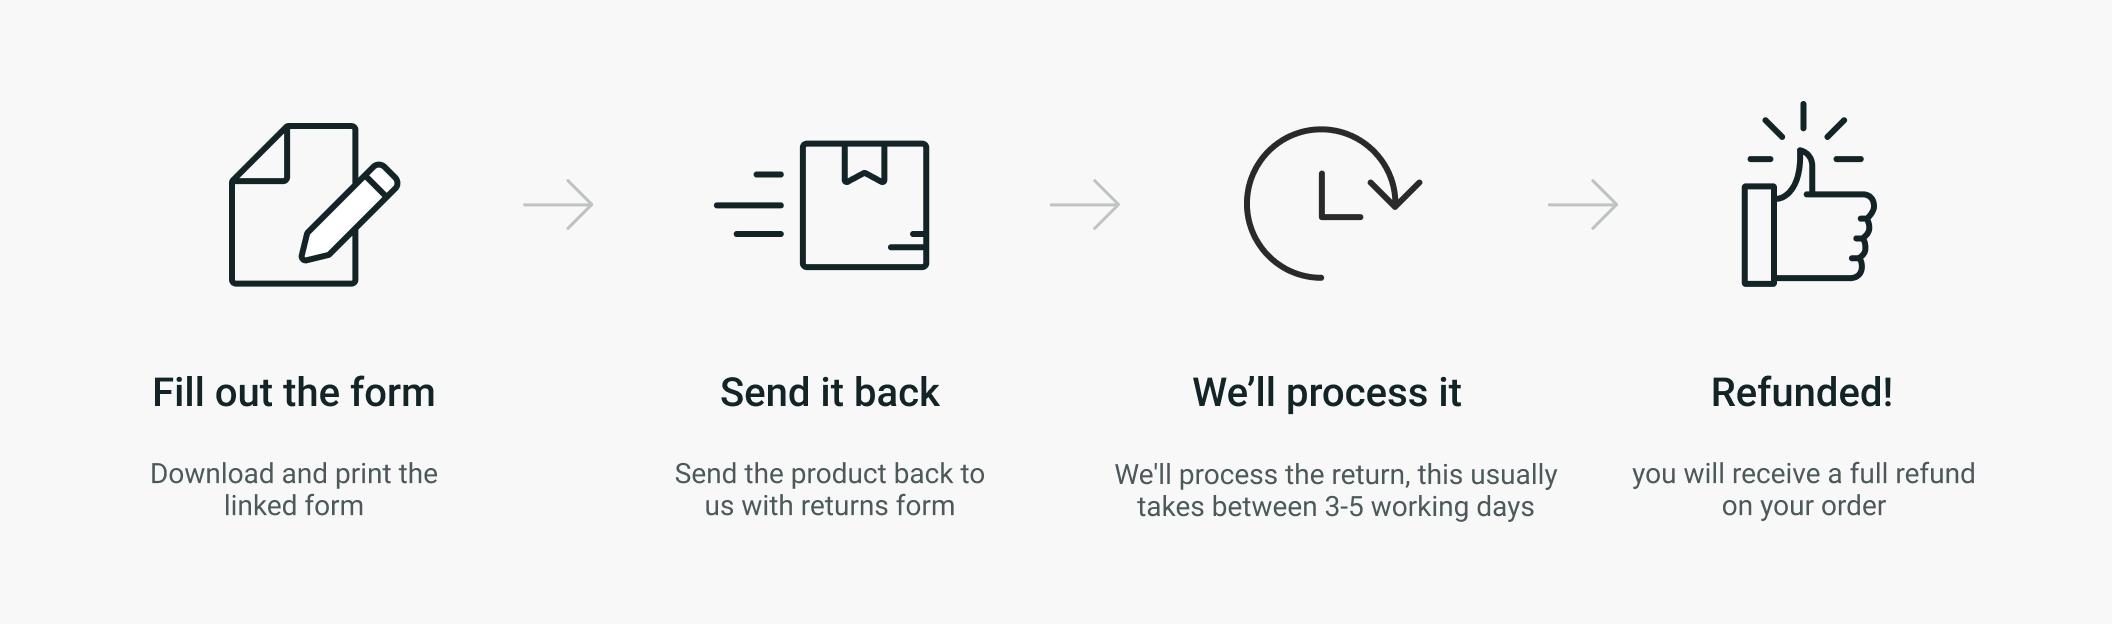 returns-graphic.jpg